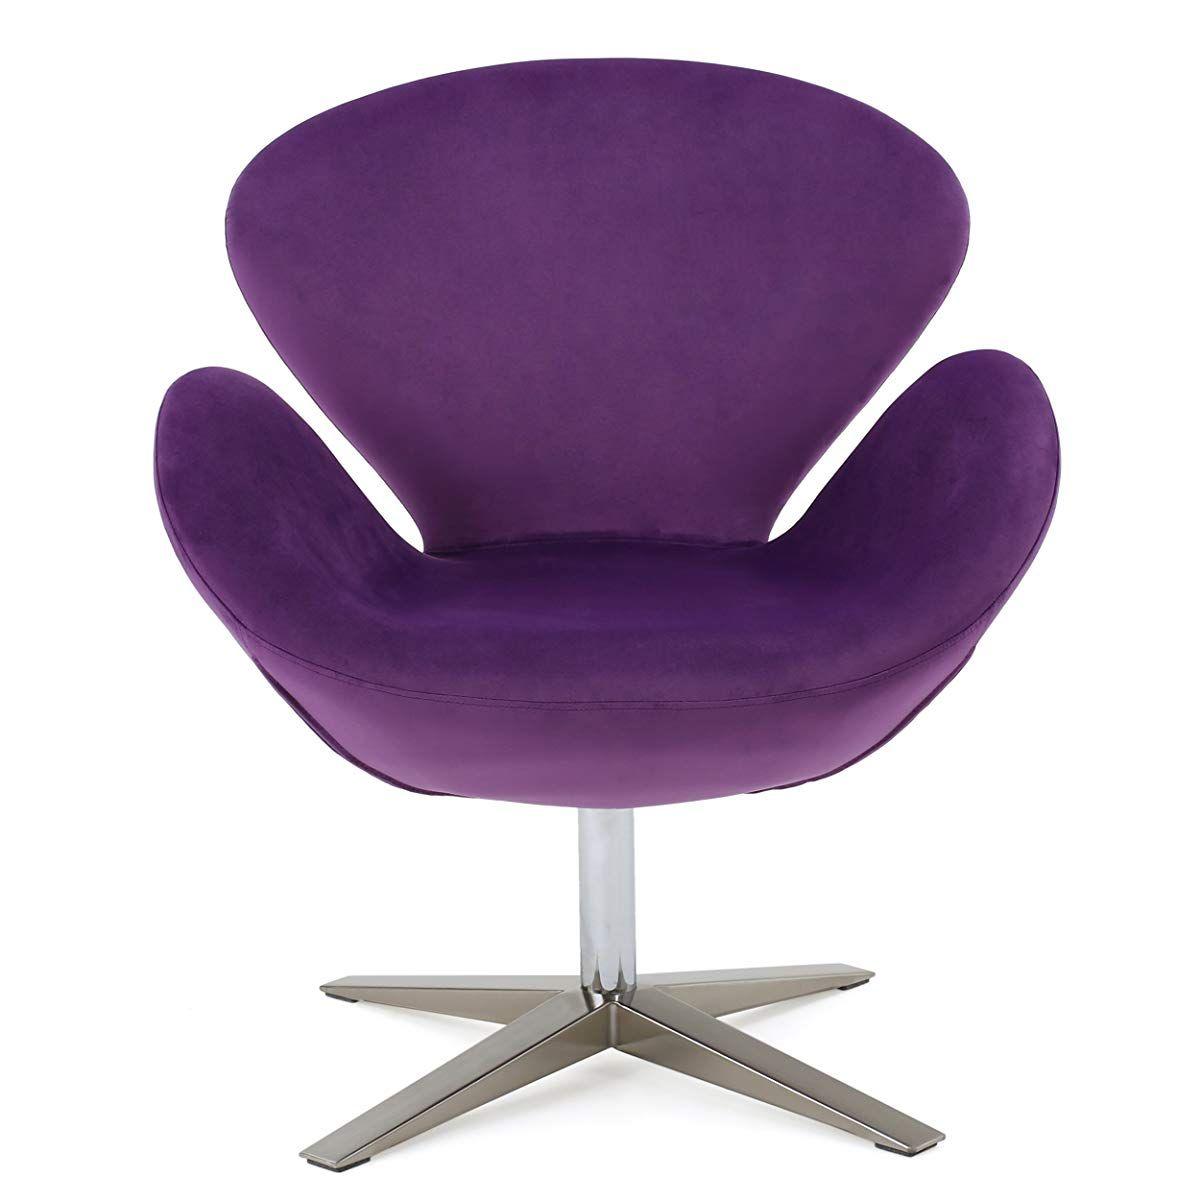 Tremendous Velvet Contour Swan Swivel Chair Accent Chair Pinterest Forskolin Free Trial Chair Design Images Forskolin Free Trialorg